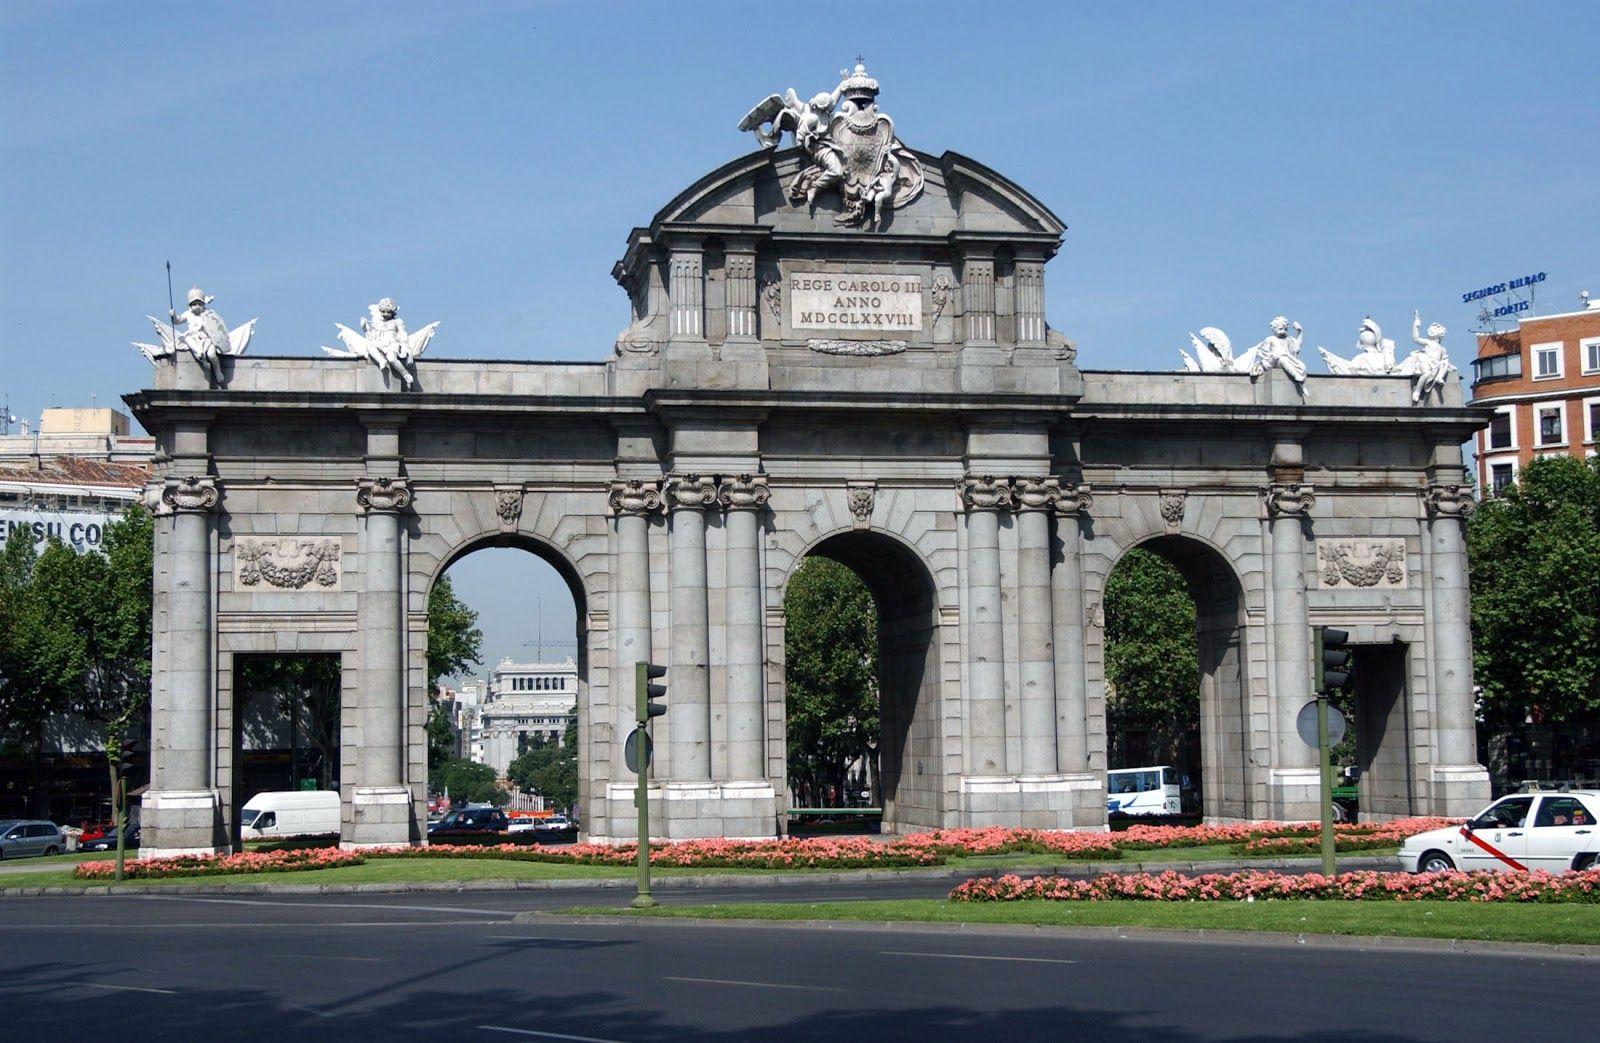 plaza de cibeles royal palace royal palace gardens plaza major